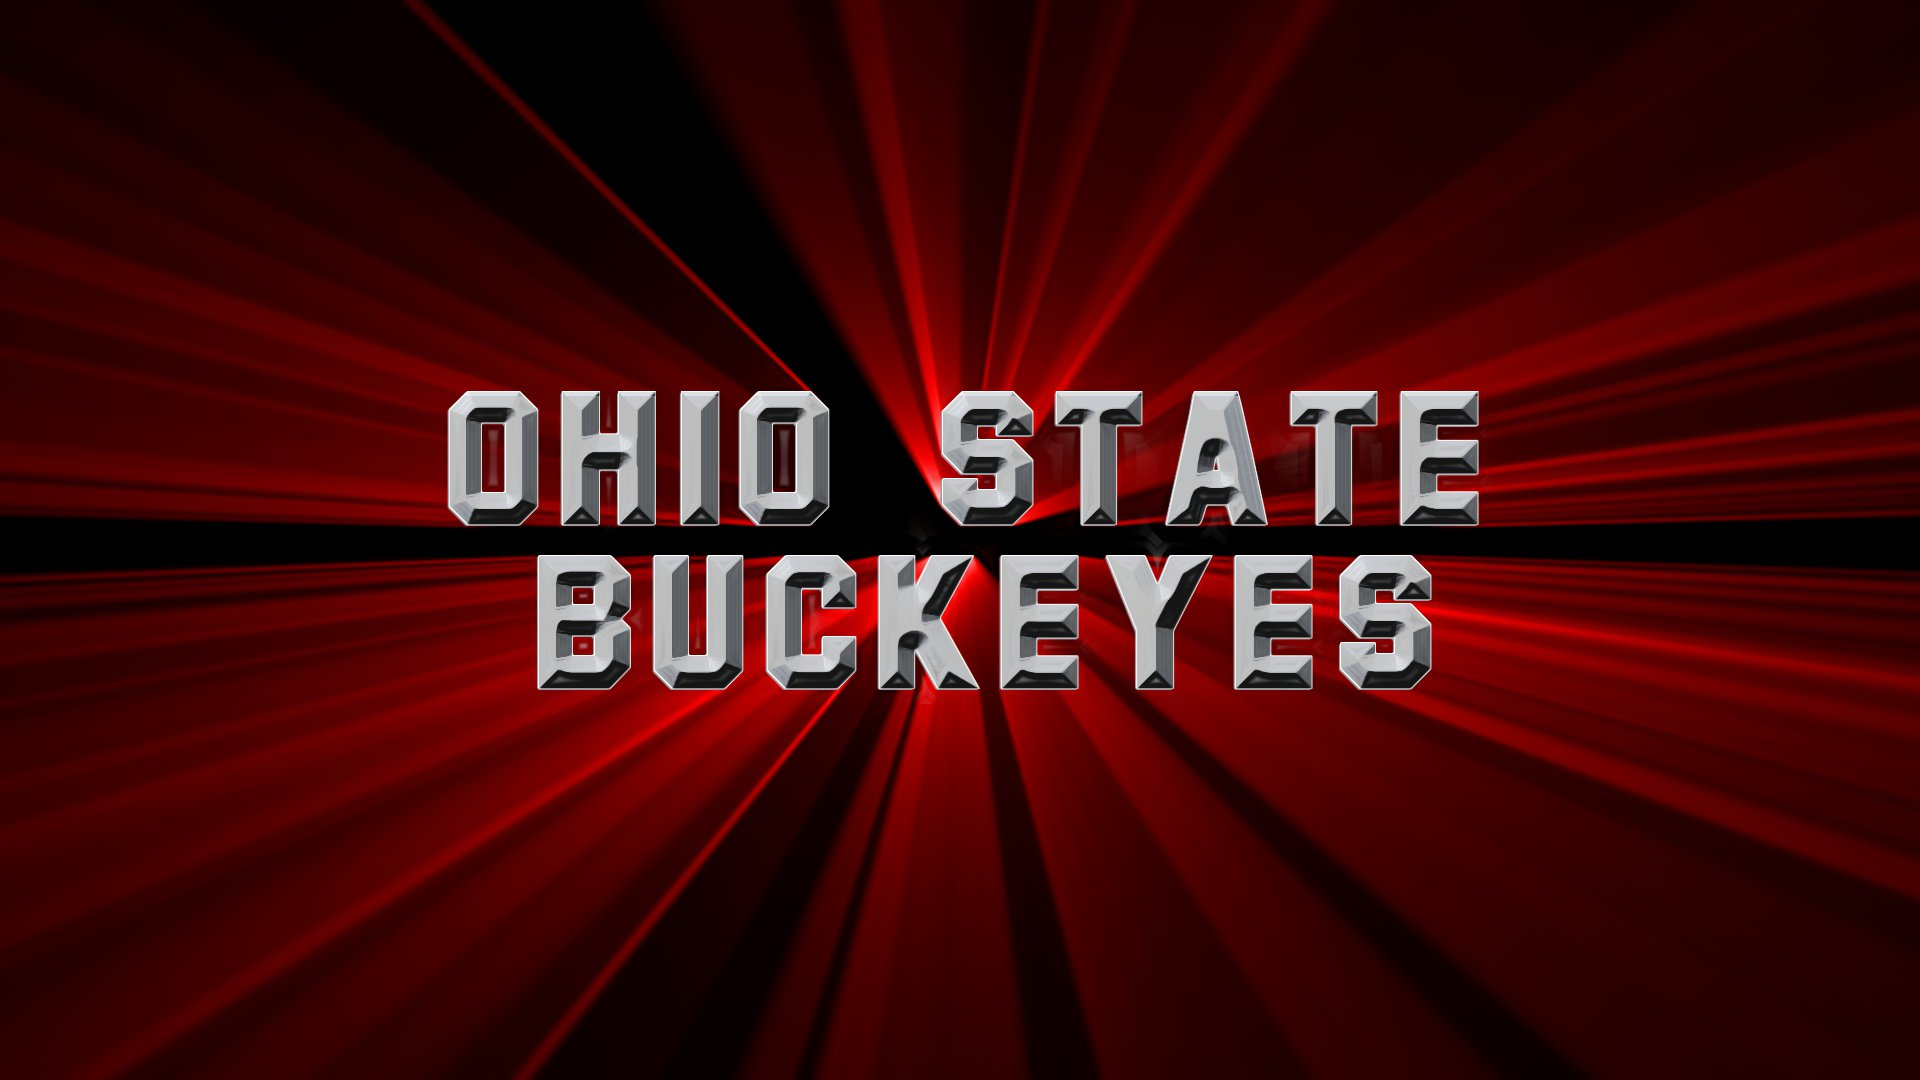 OSU Wallpaper 26 - Ohio State Football Wallpaper (29199769) - Fanpop